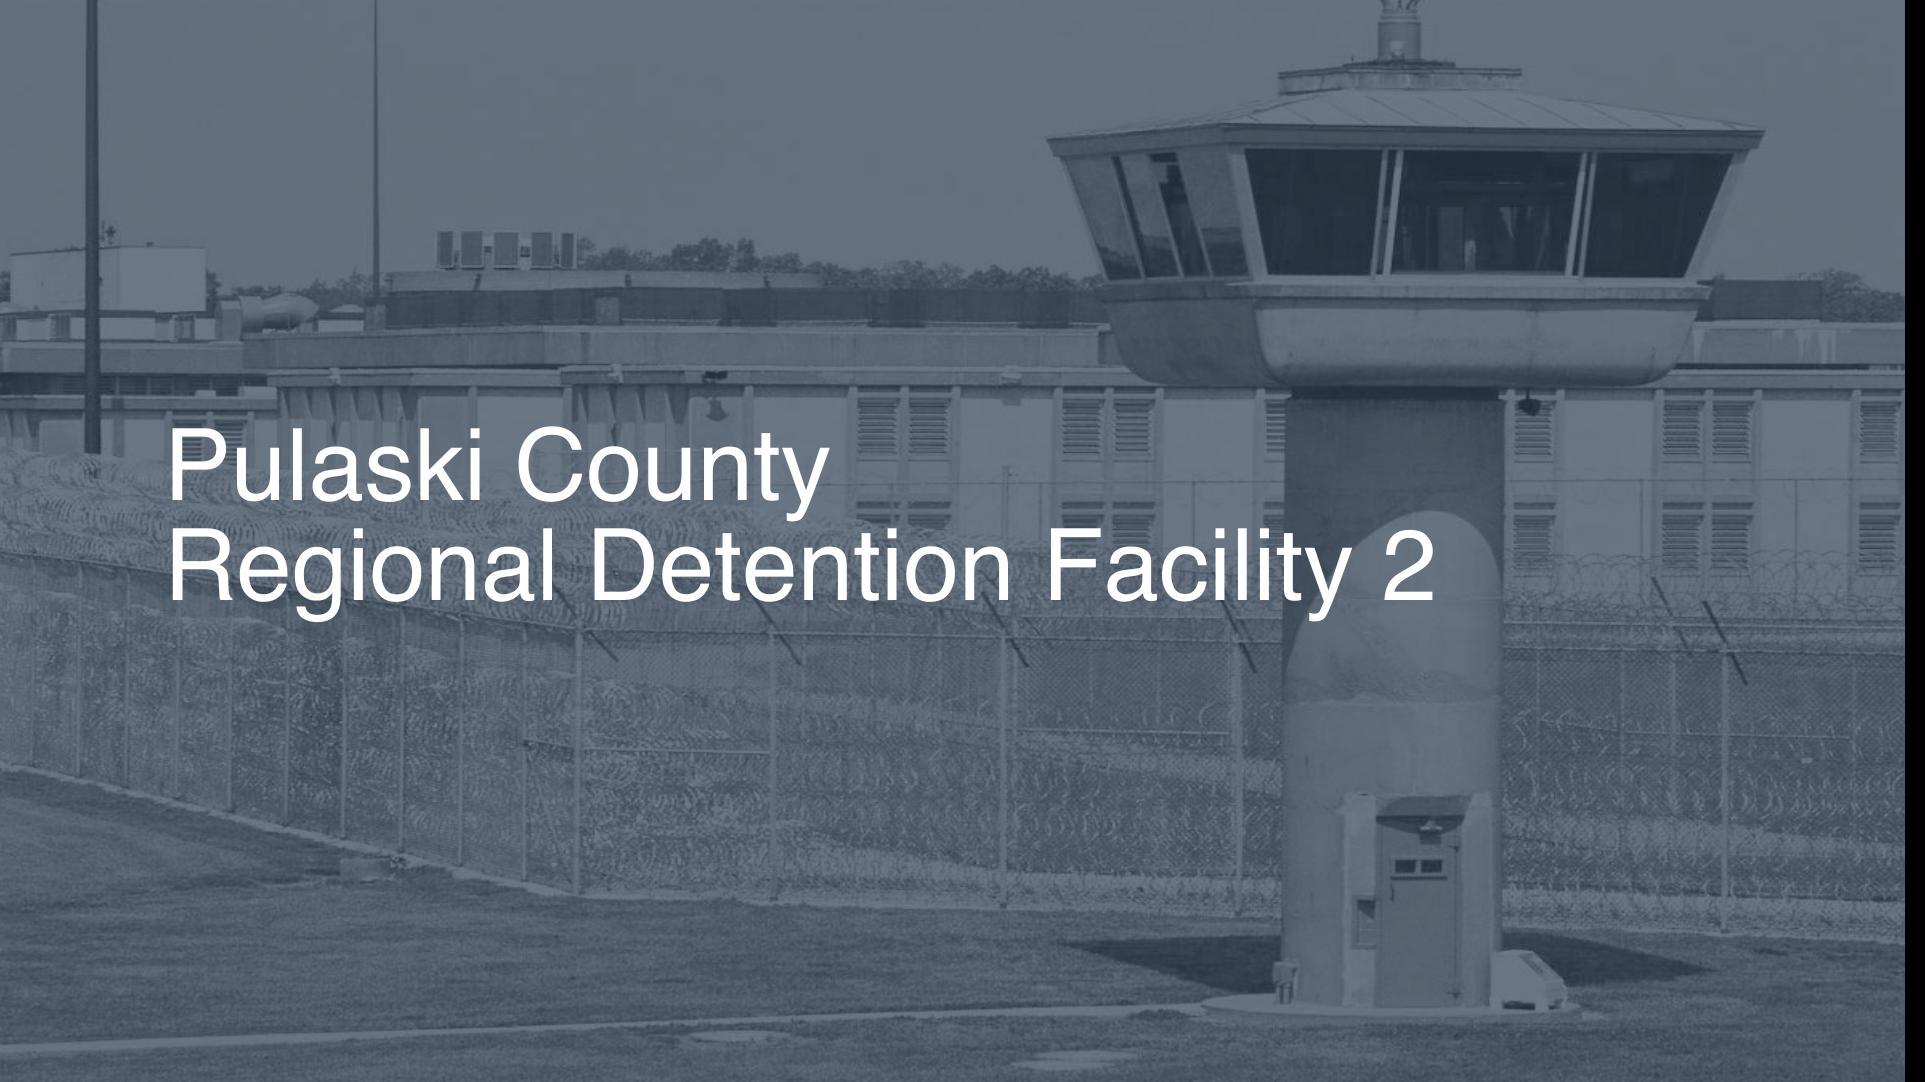 Pulaski County Regional Detention Facility   Pigeonly